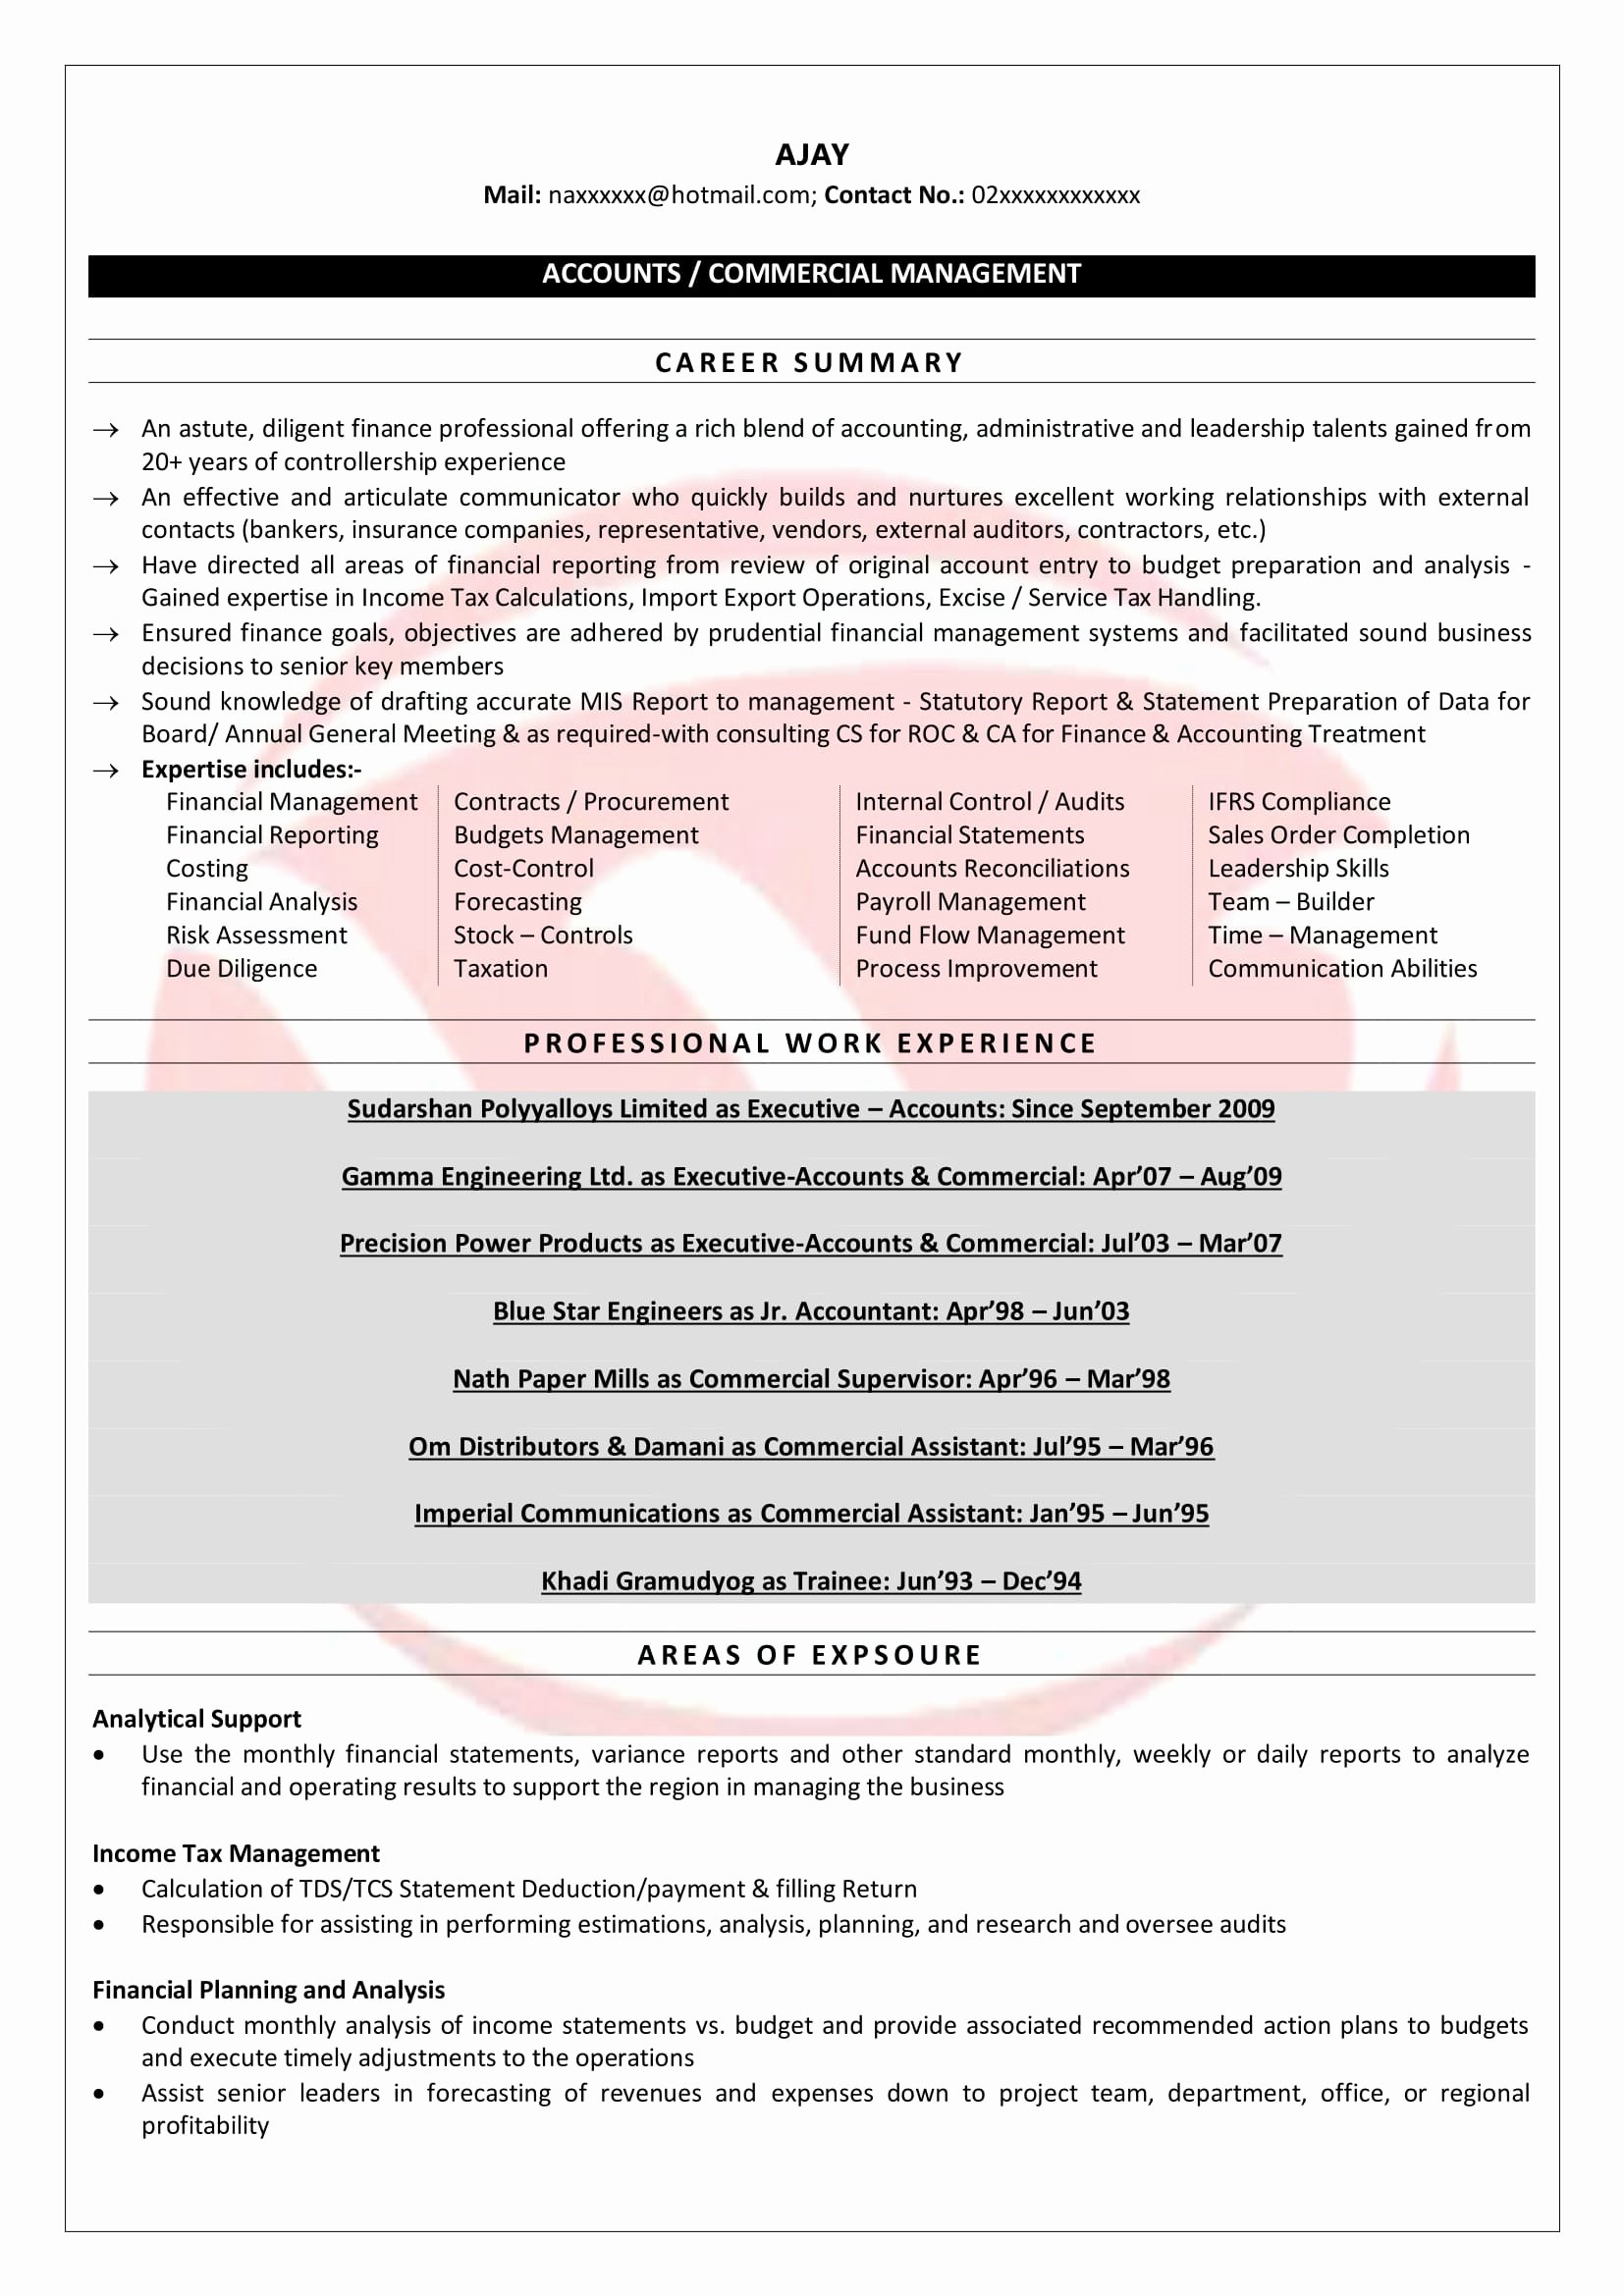 Accountant Resume Sample Pdf Fresh Senior Accountant Sample Resumes Download Resume format Templates